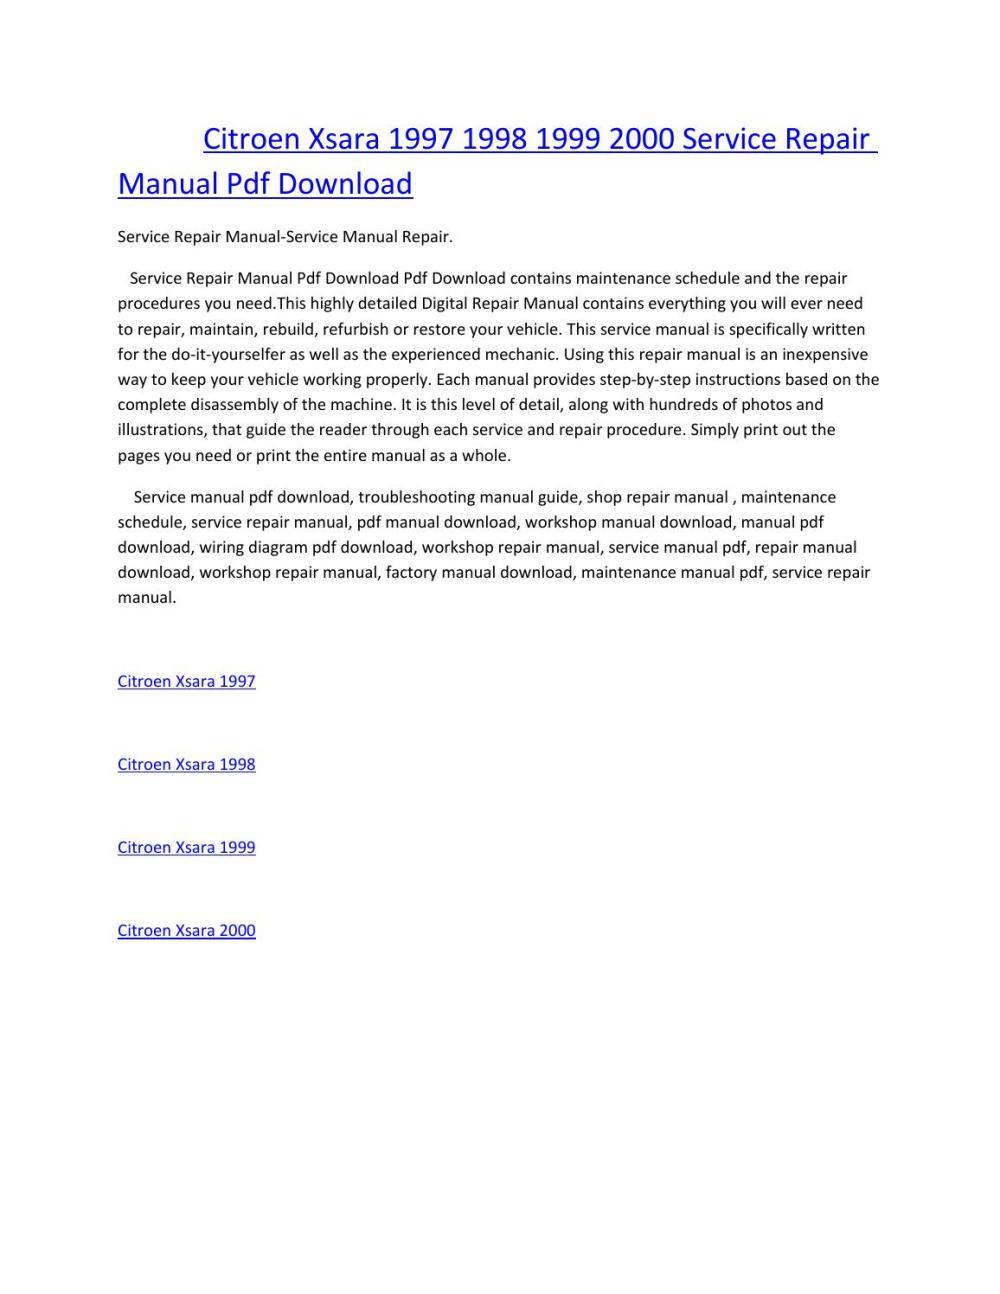 medium resolution of citroen xsara 1997 1998 1999 2000 service manual repair pdf download by amurgului issuu